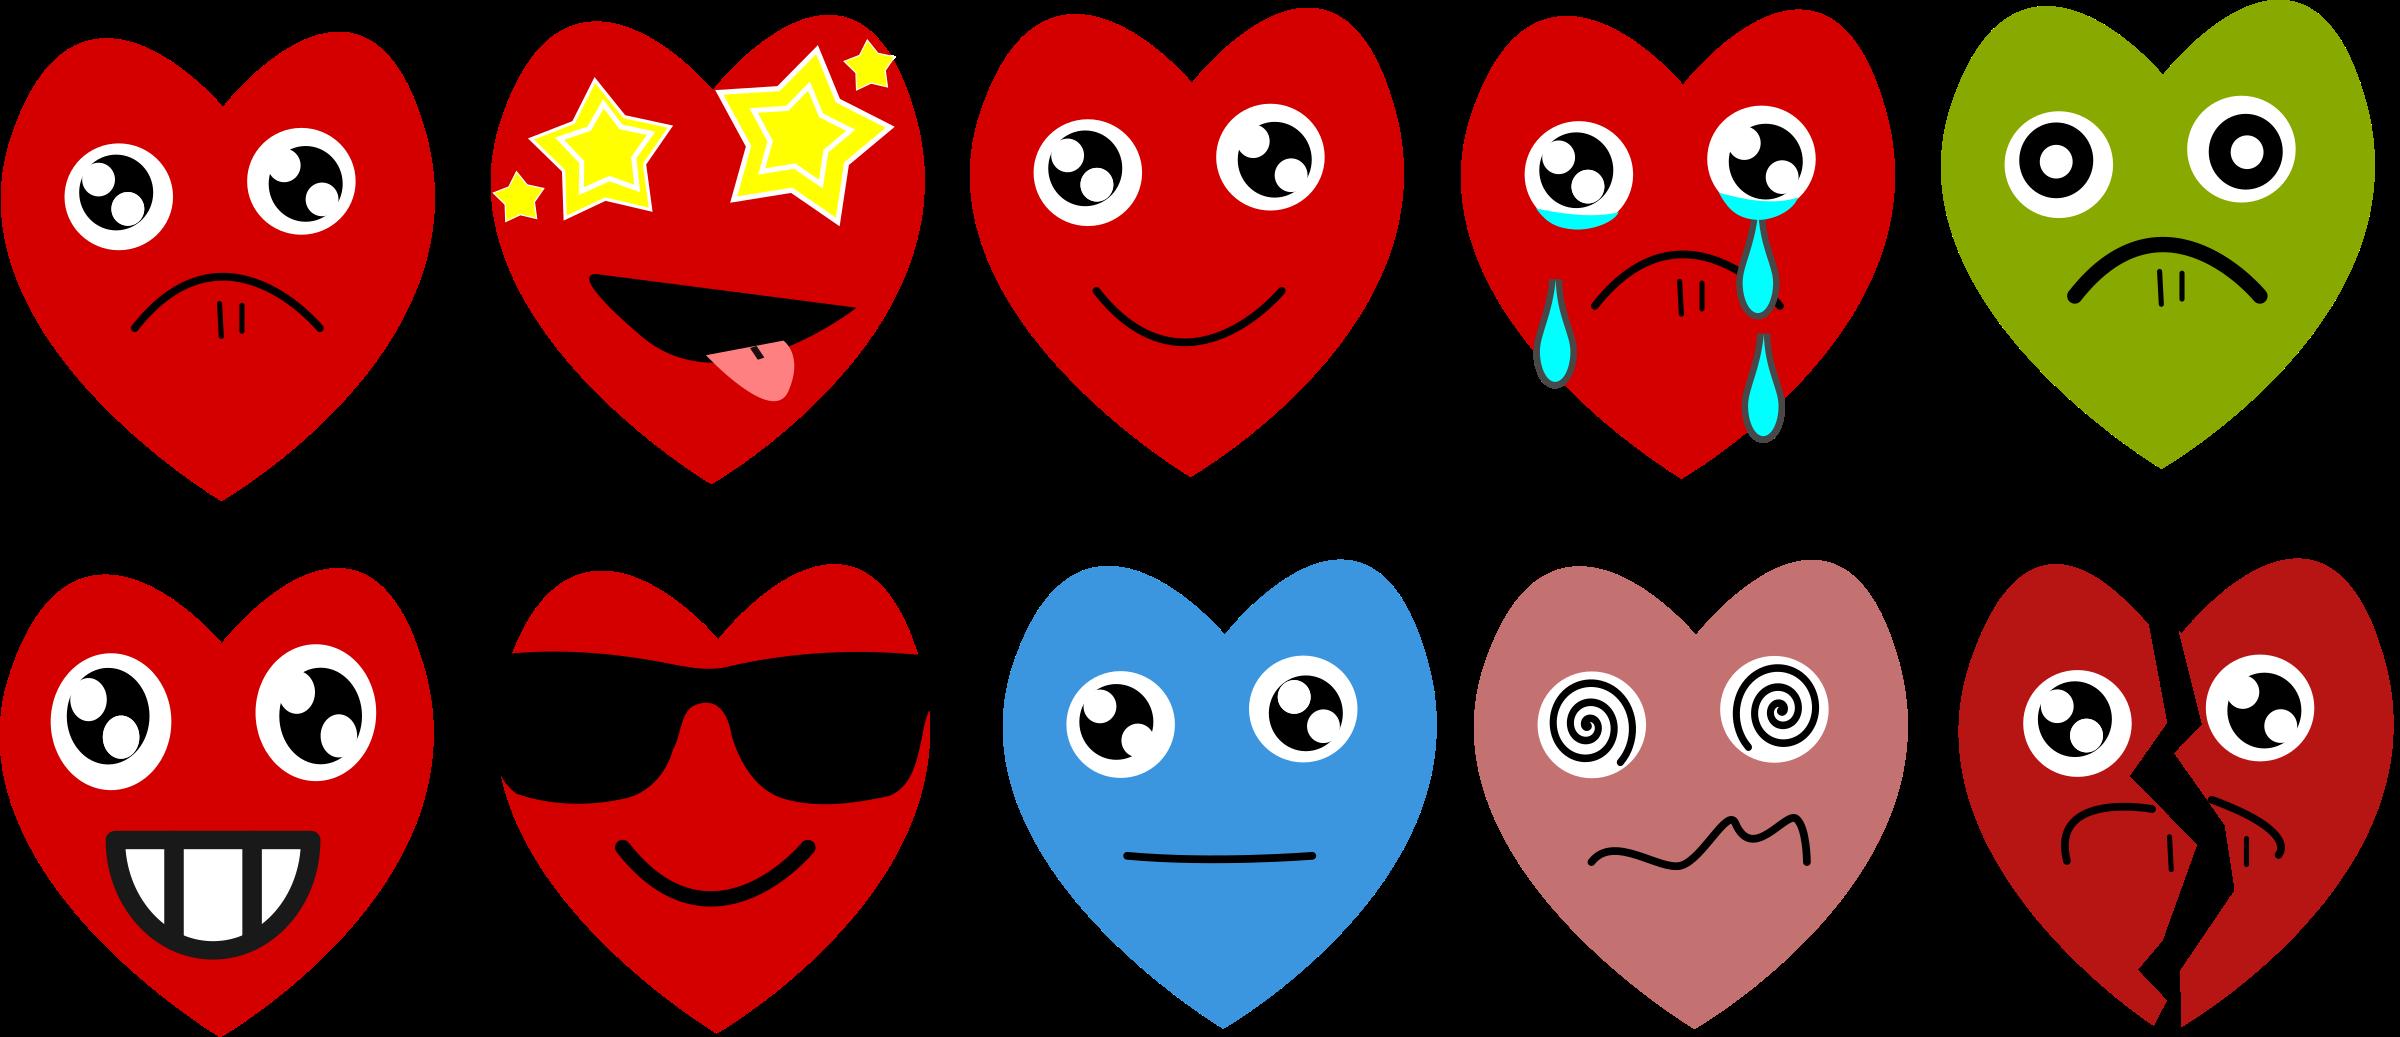 Heart big image png. Sunglasses clipart emoji